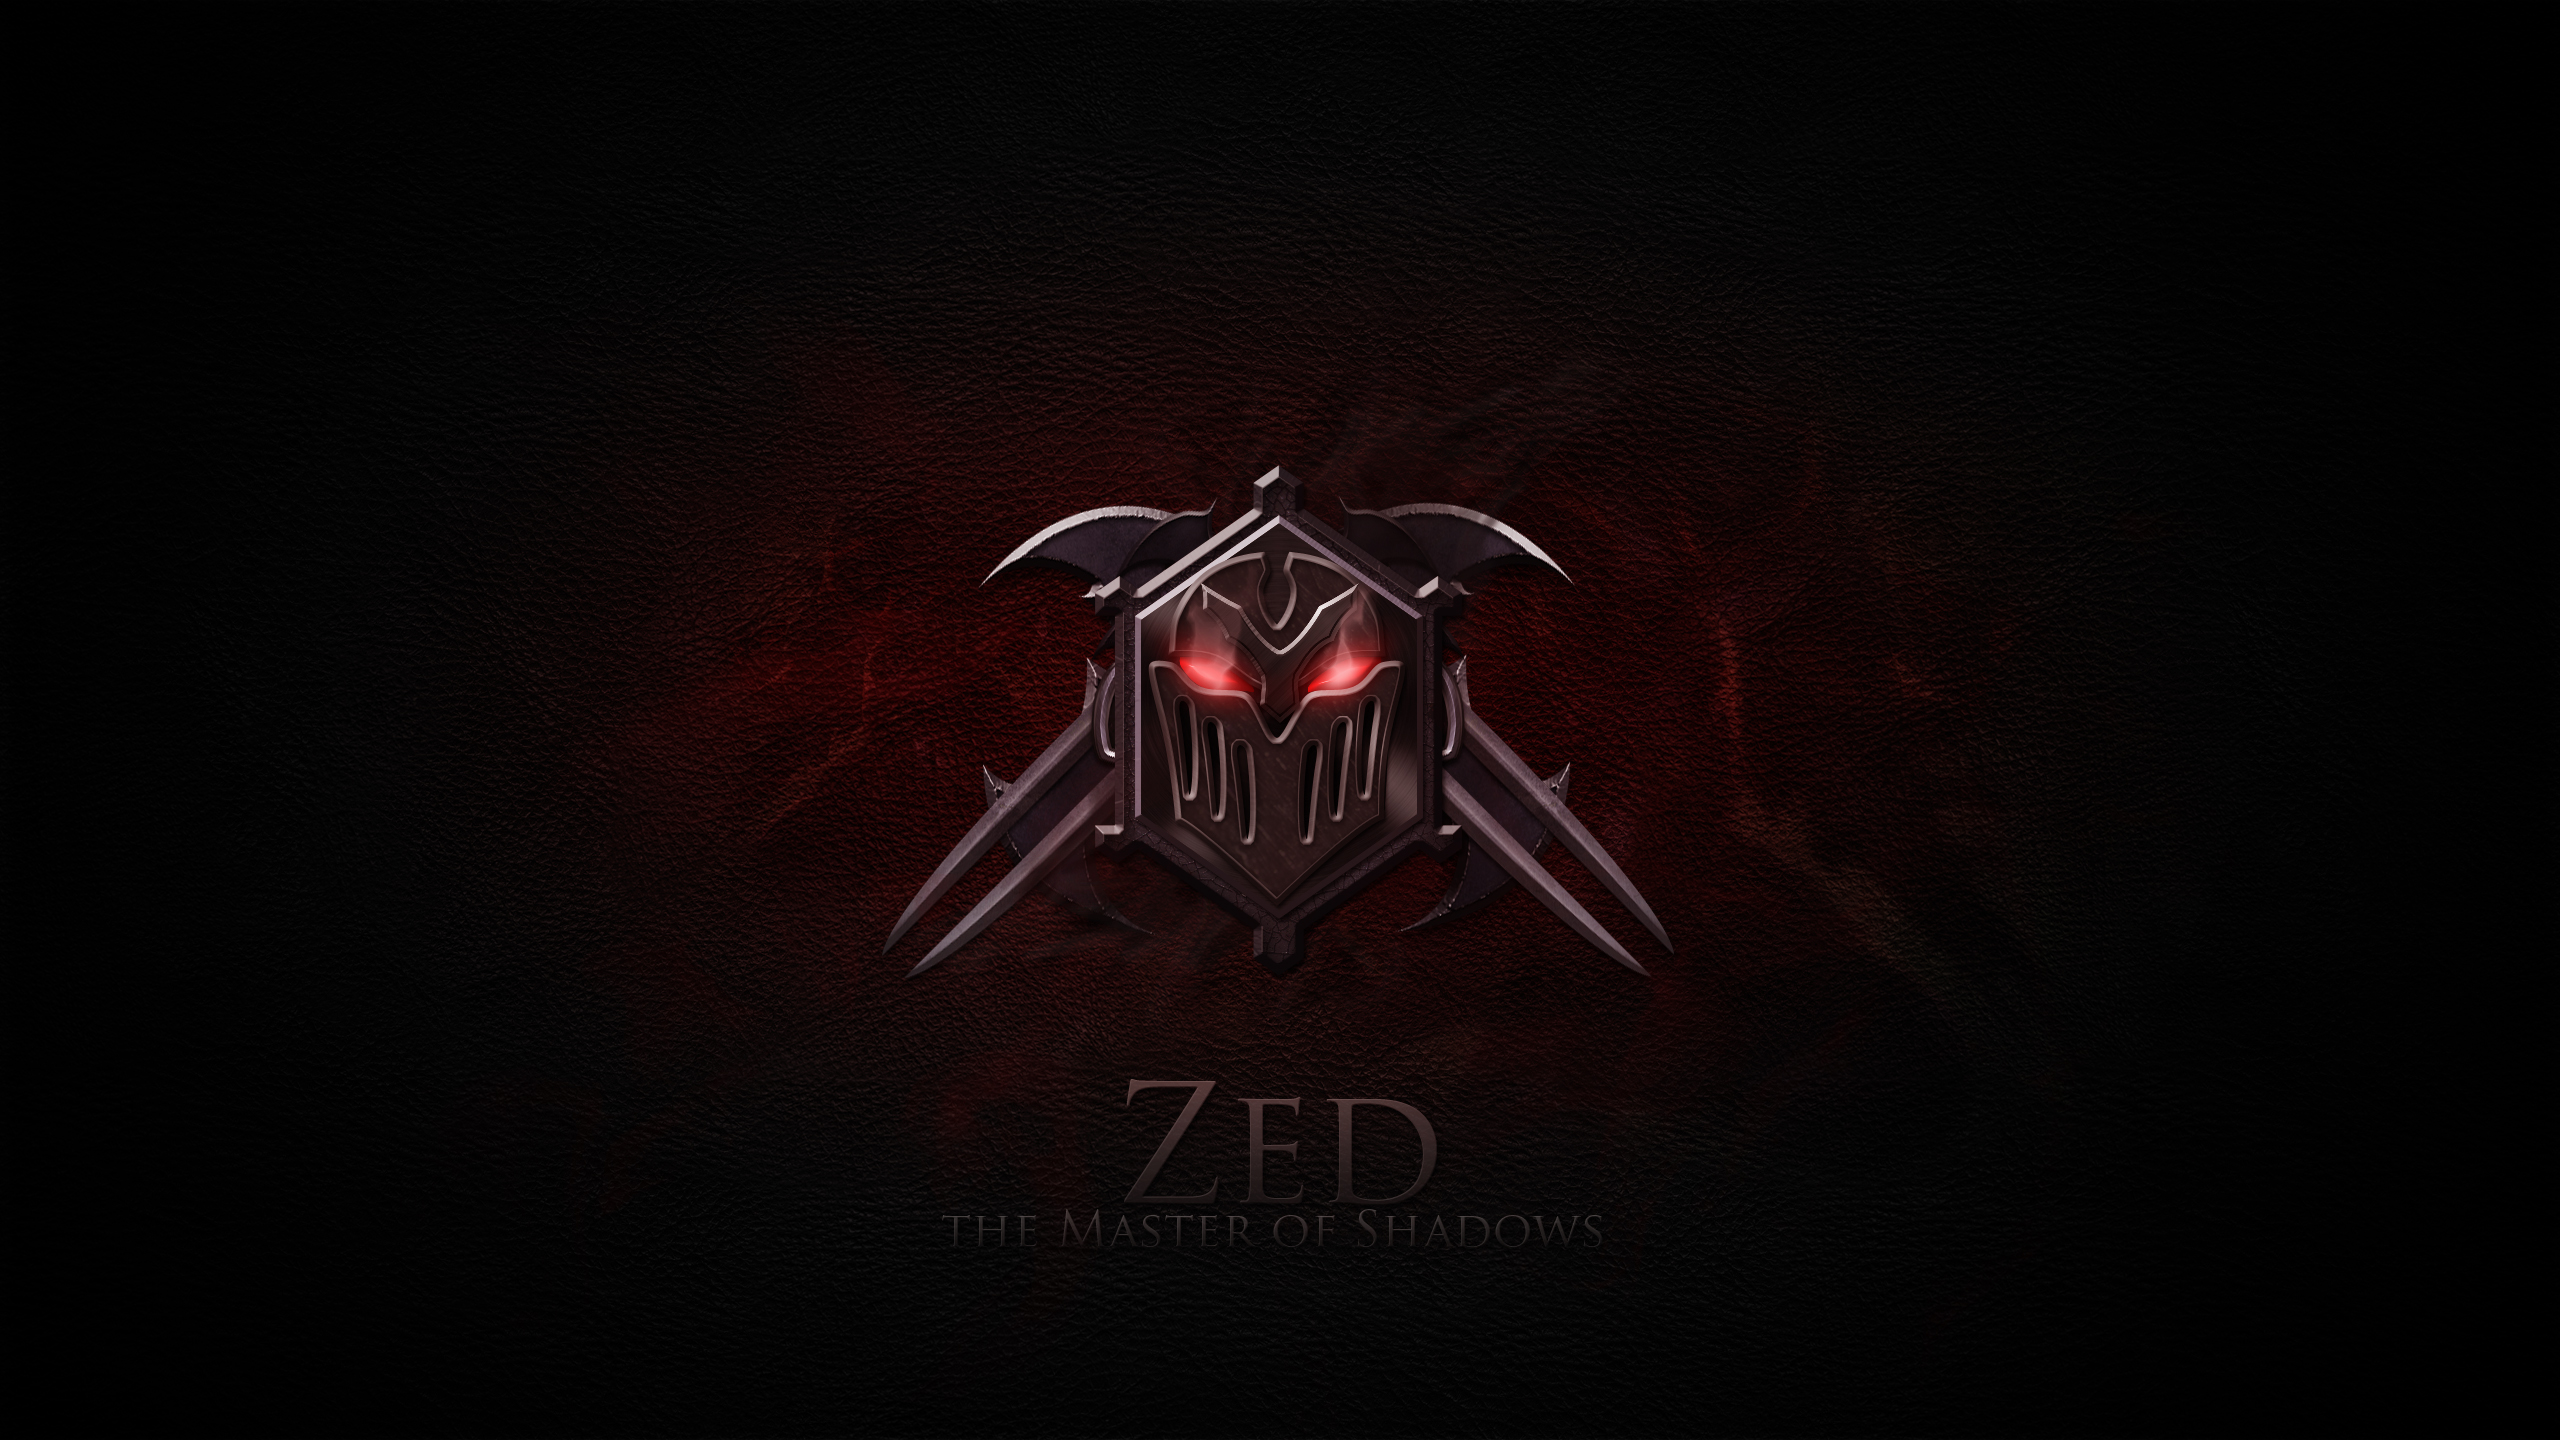 Zed wallpaper